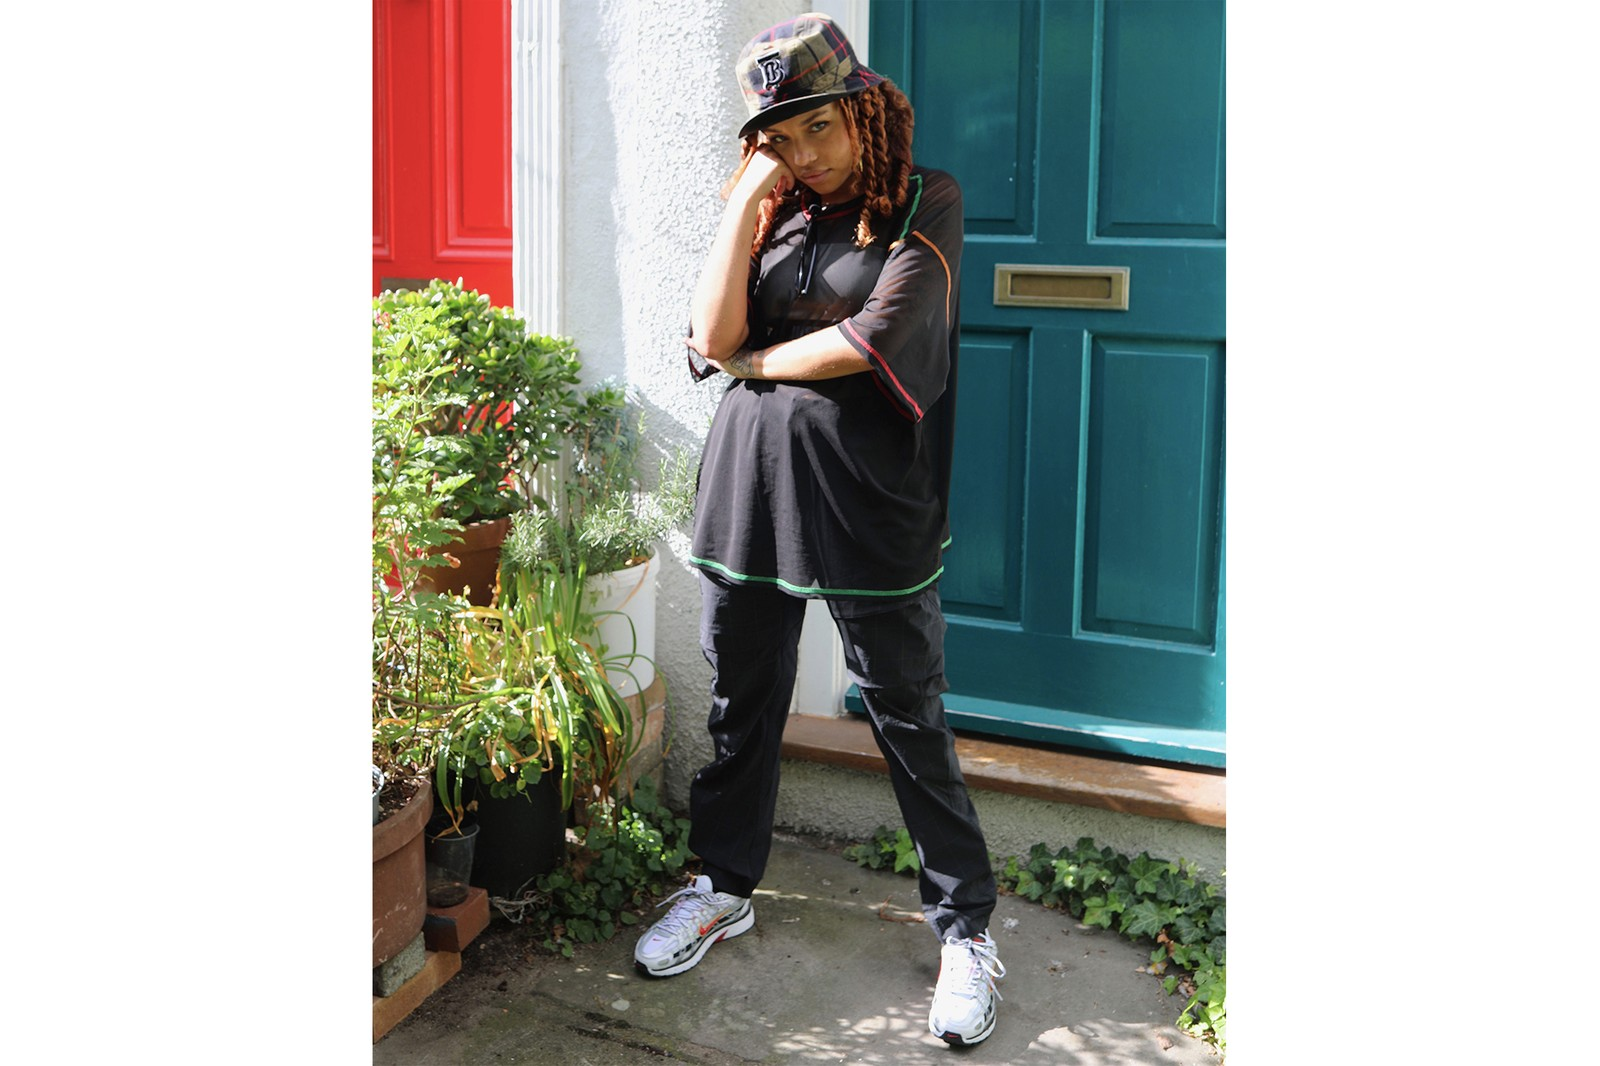 Singer-songwriter JGrrey Interview Shoot Billie Eilish Album Single EP Release Fashion London UK Industry